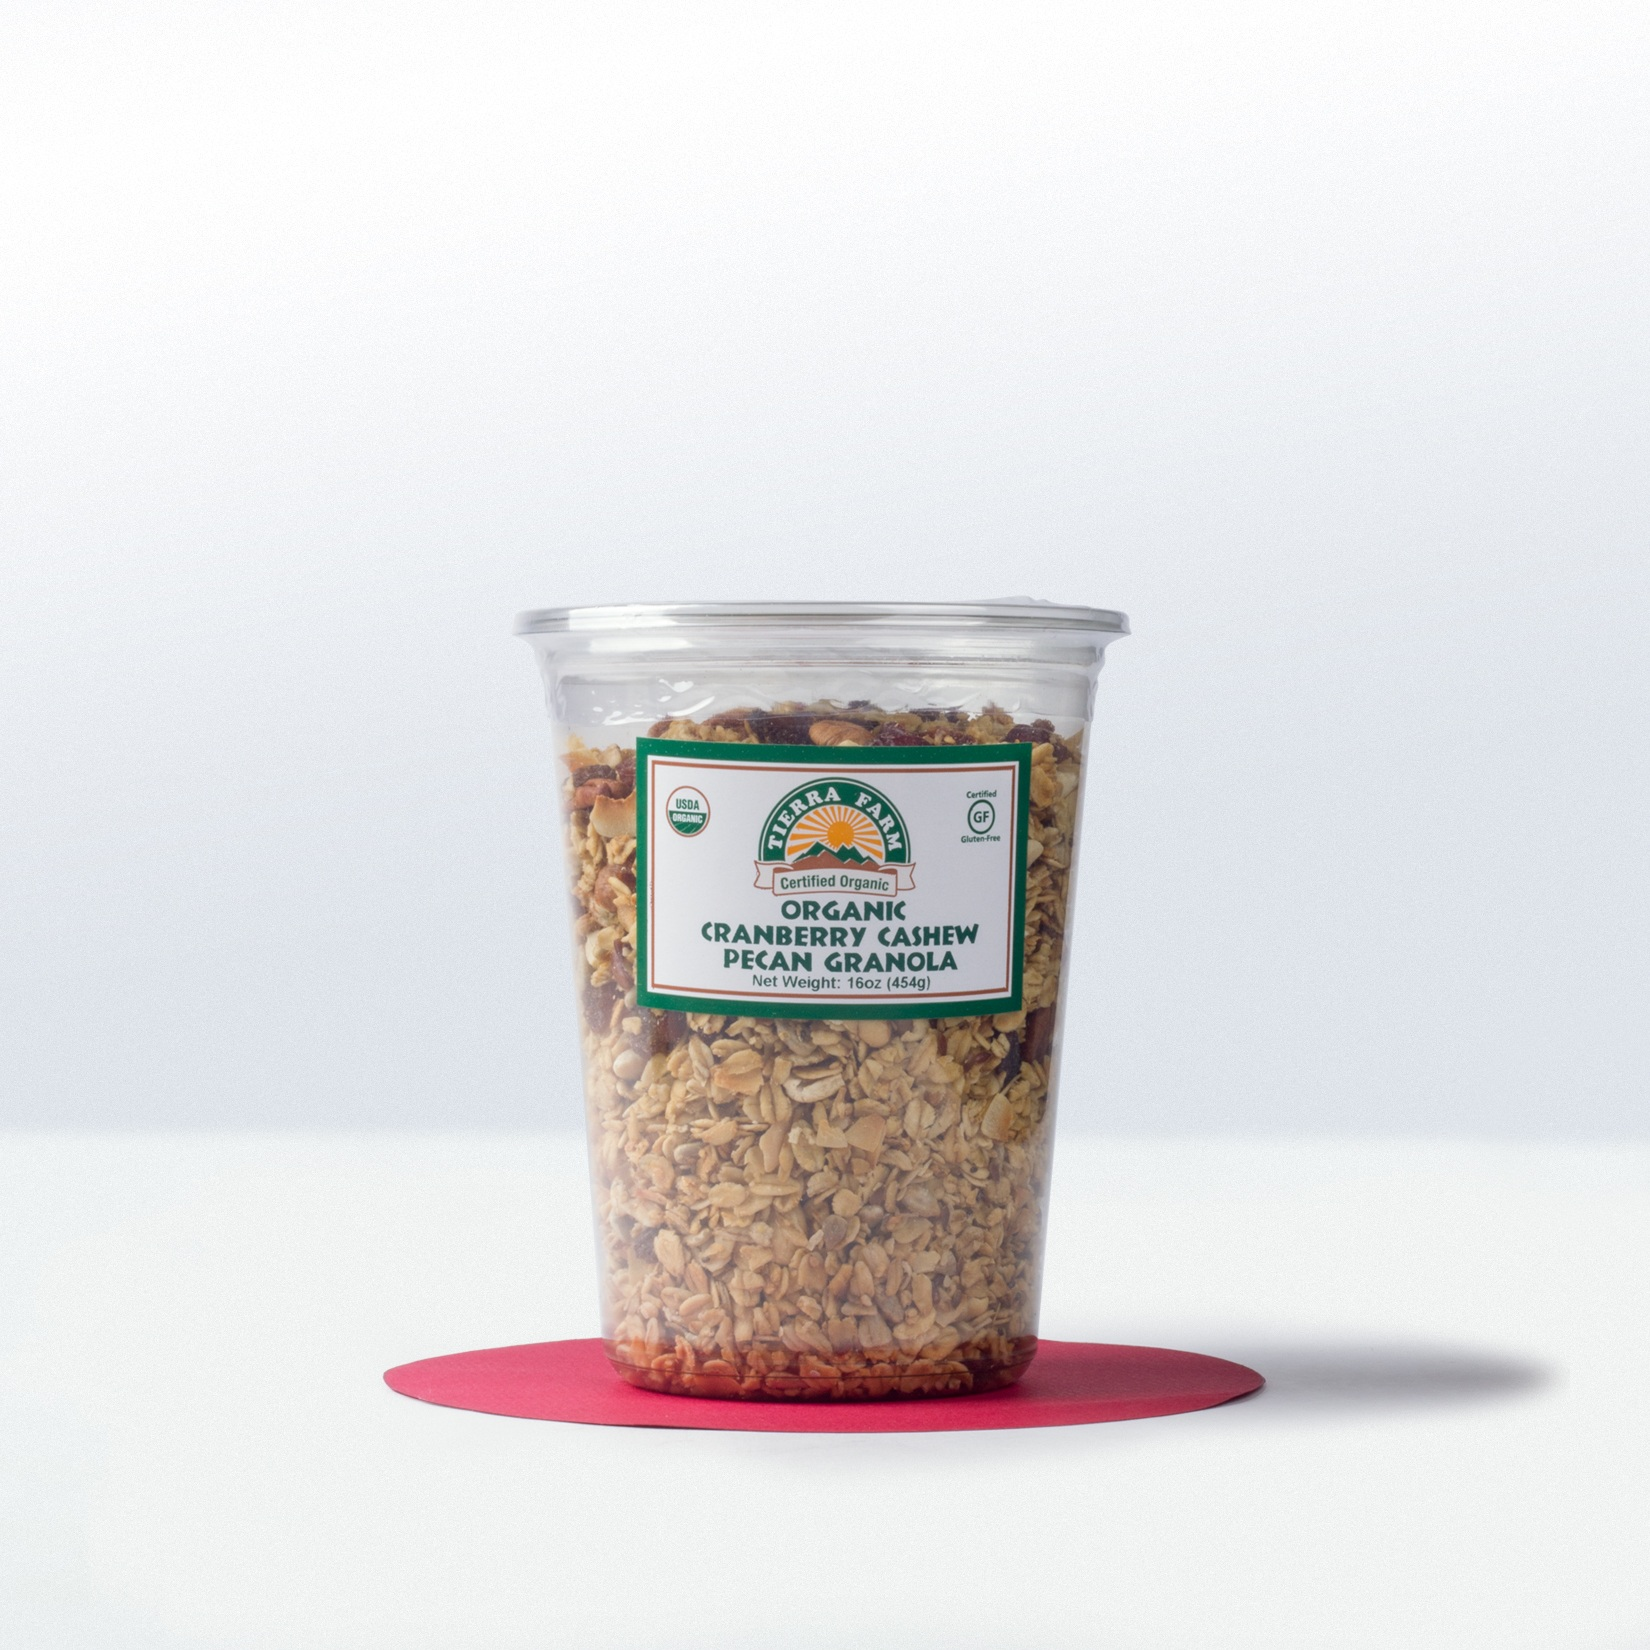 Tierra Farm-Organic Cranberry CashewPecan Granola